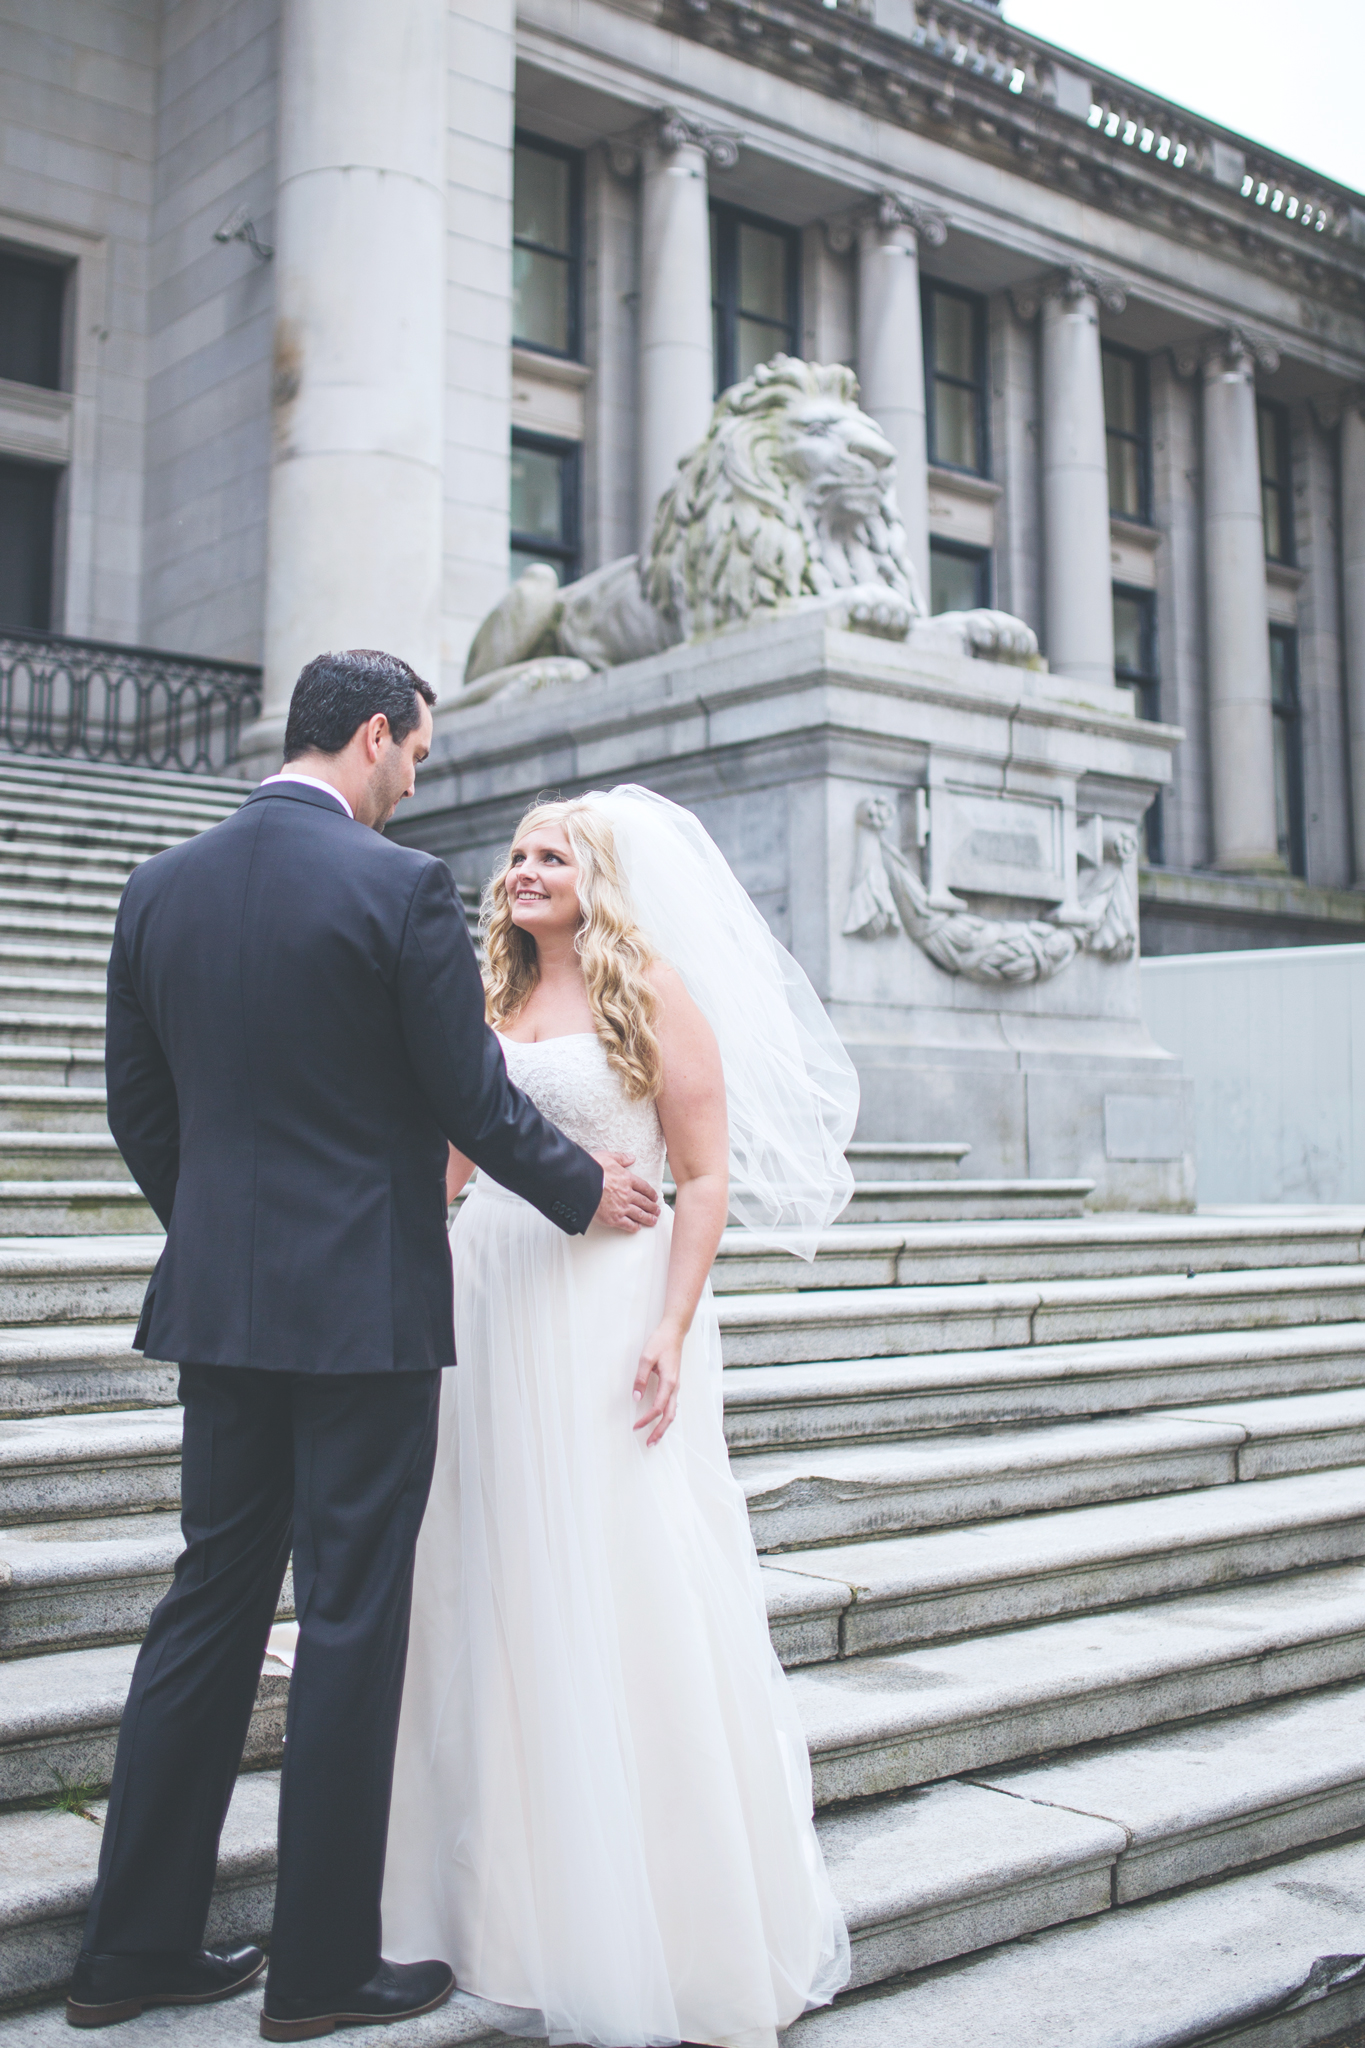 IMG_7466-WEB-VANCOUVER-WEDDING-PHOTOGRAPHER-JENNIFER-PICARD-PHOTOGRAPHY.jpg